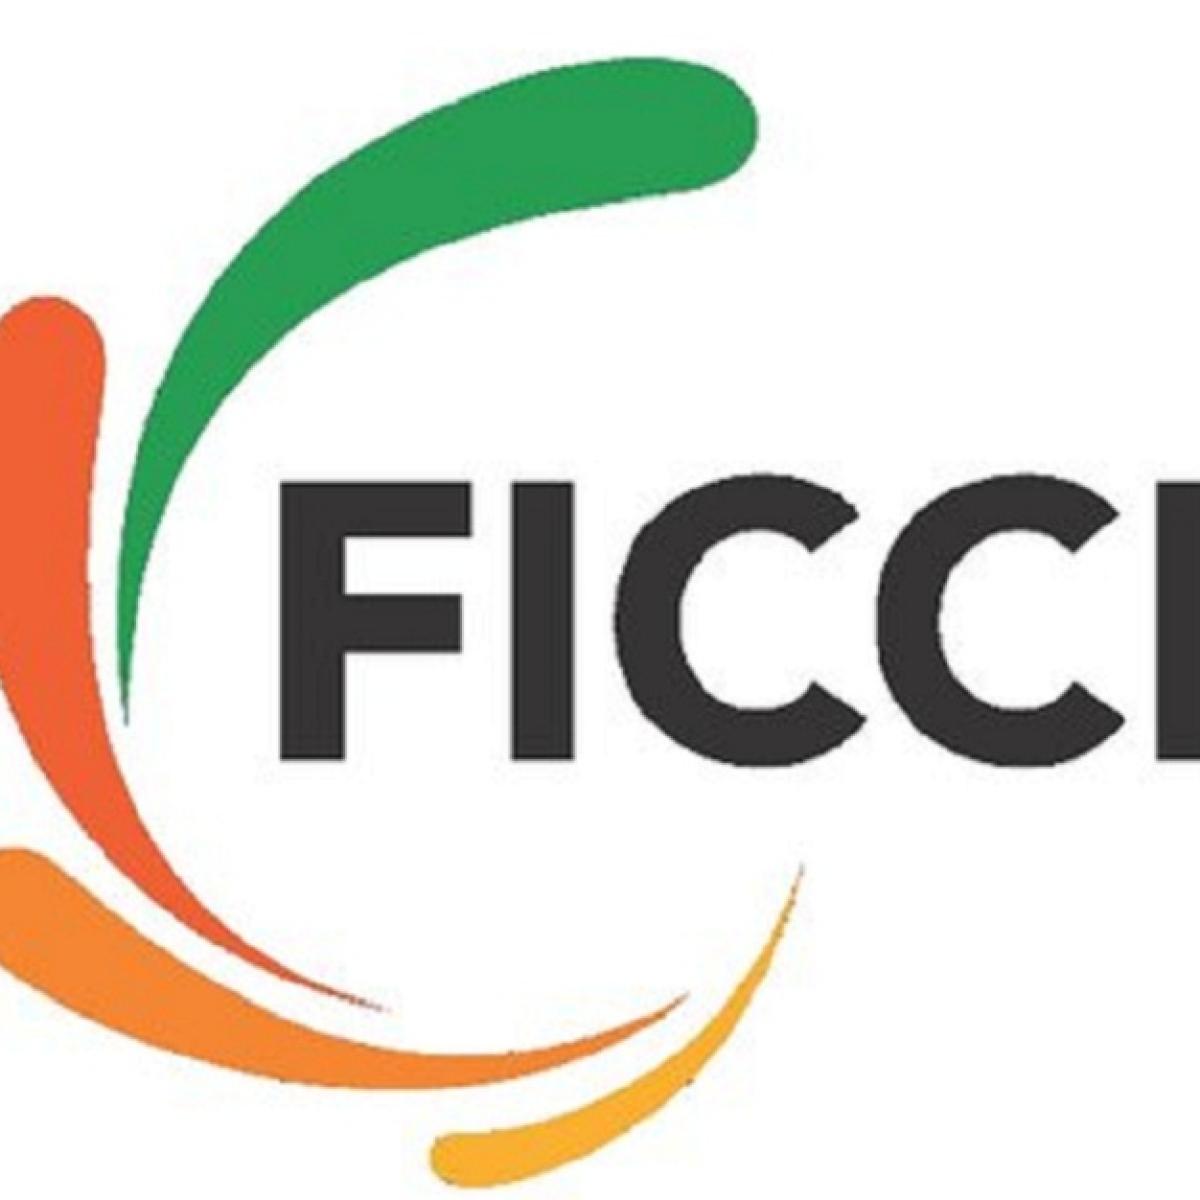 Ficci for increasing FDI cap in insurance to 74 pc